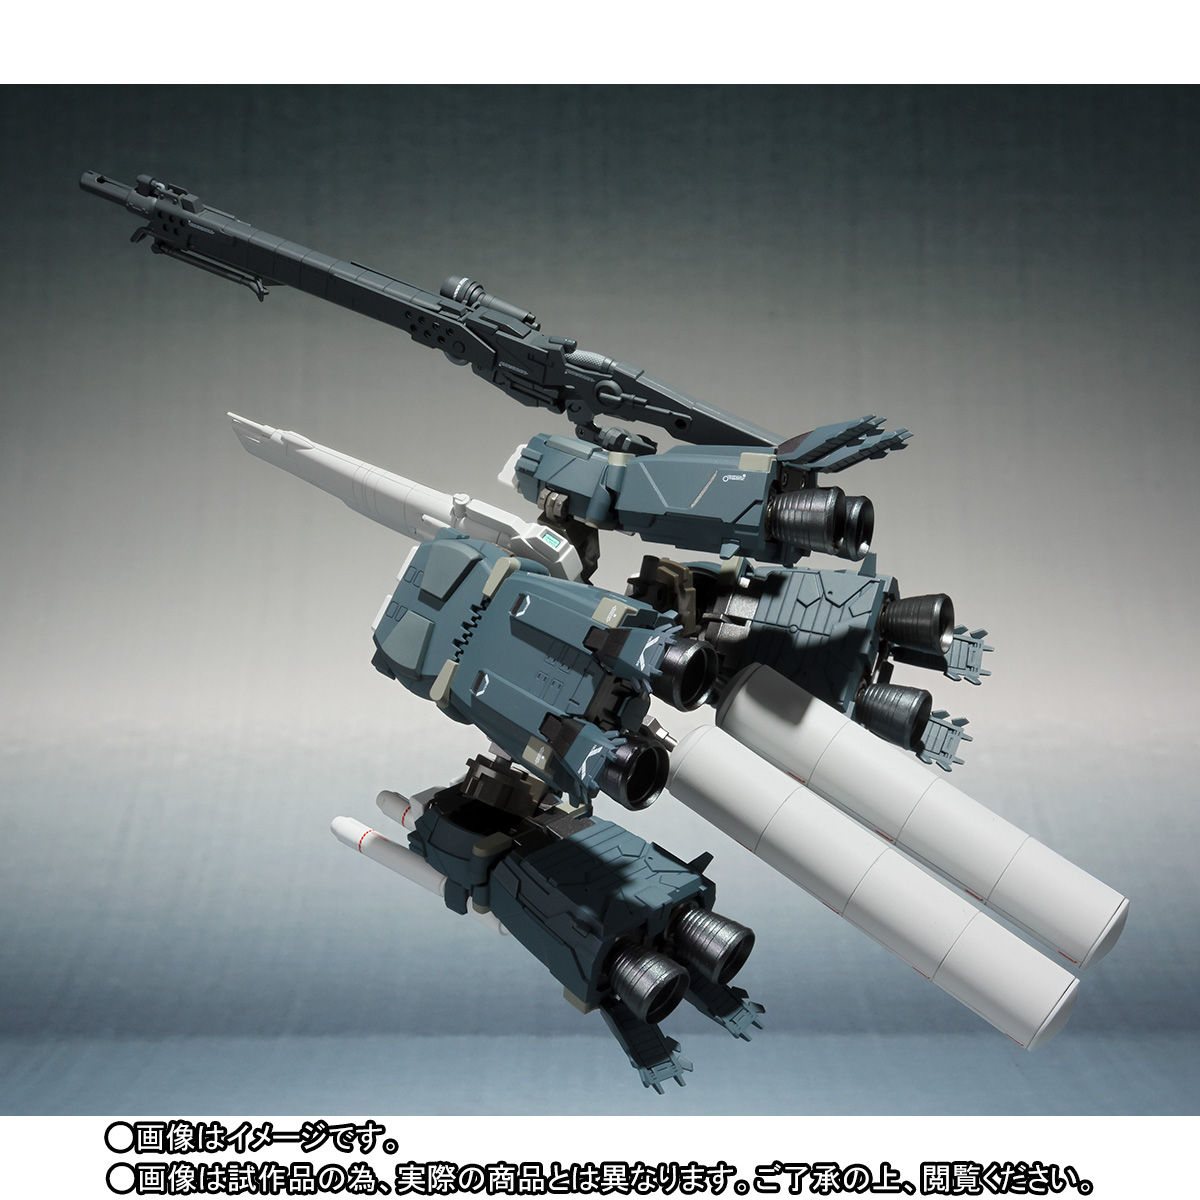 METAL ROBOT魂(Ka signature)<SIDE MS>『Sガンダム専用オプションパーツ ブースターユニット』オプションパーツ-004